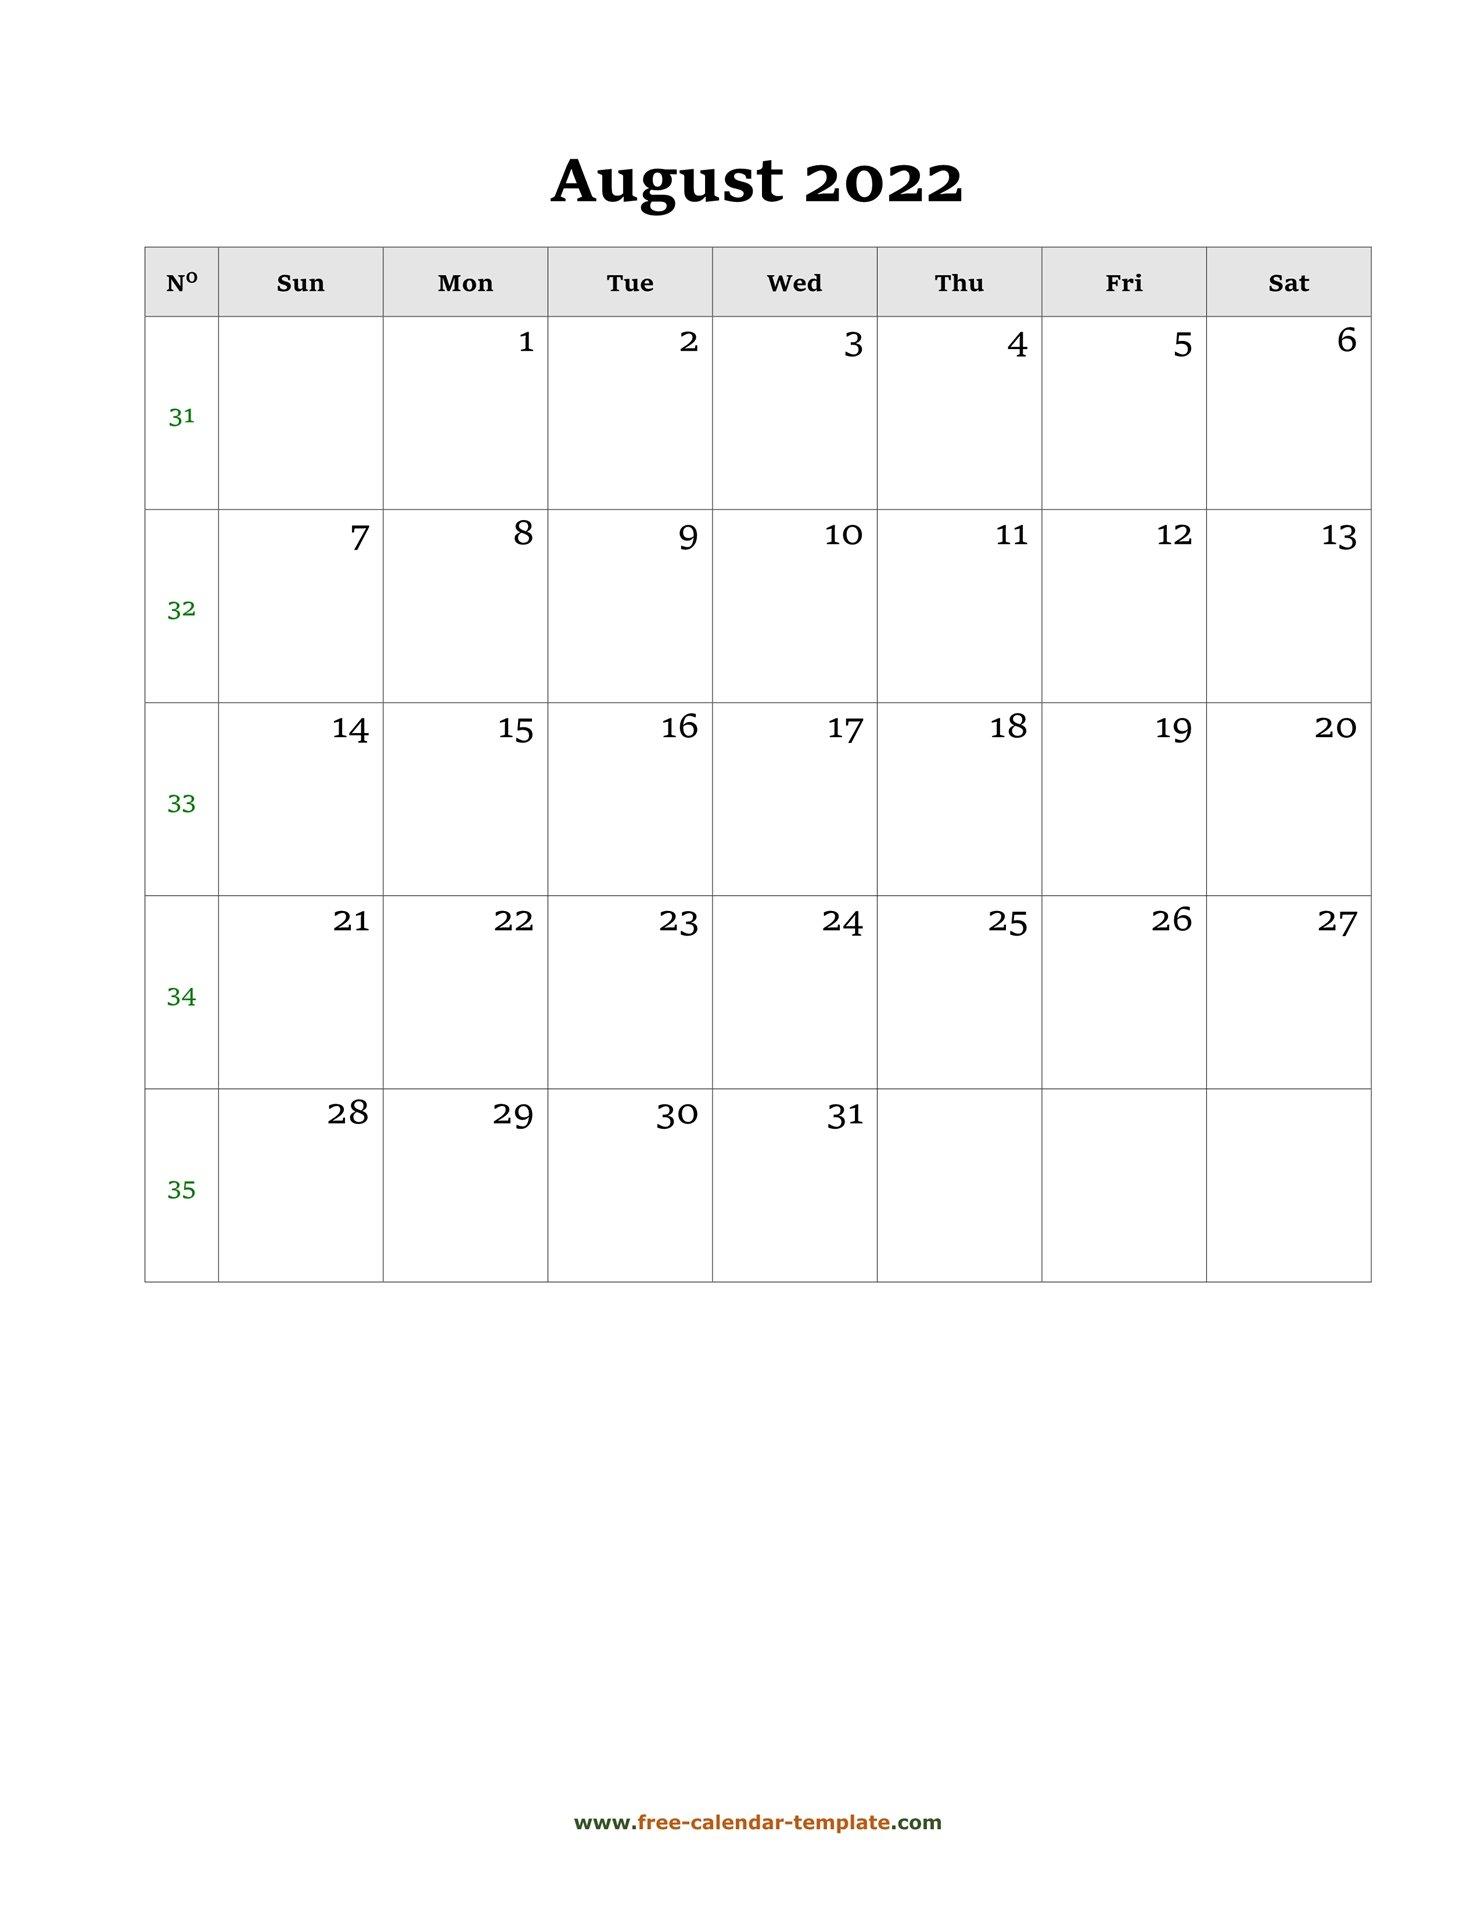 August 2022 Free Calendar Tempplate   Free-Calendar with Free Printable Calendar August 2022